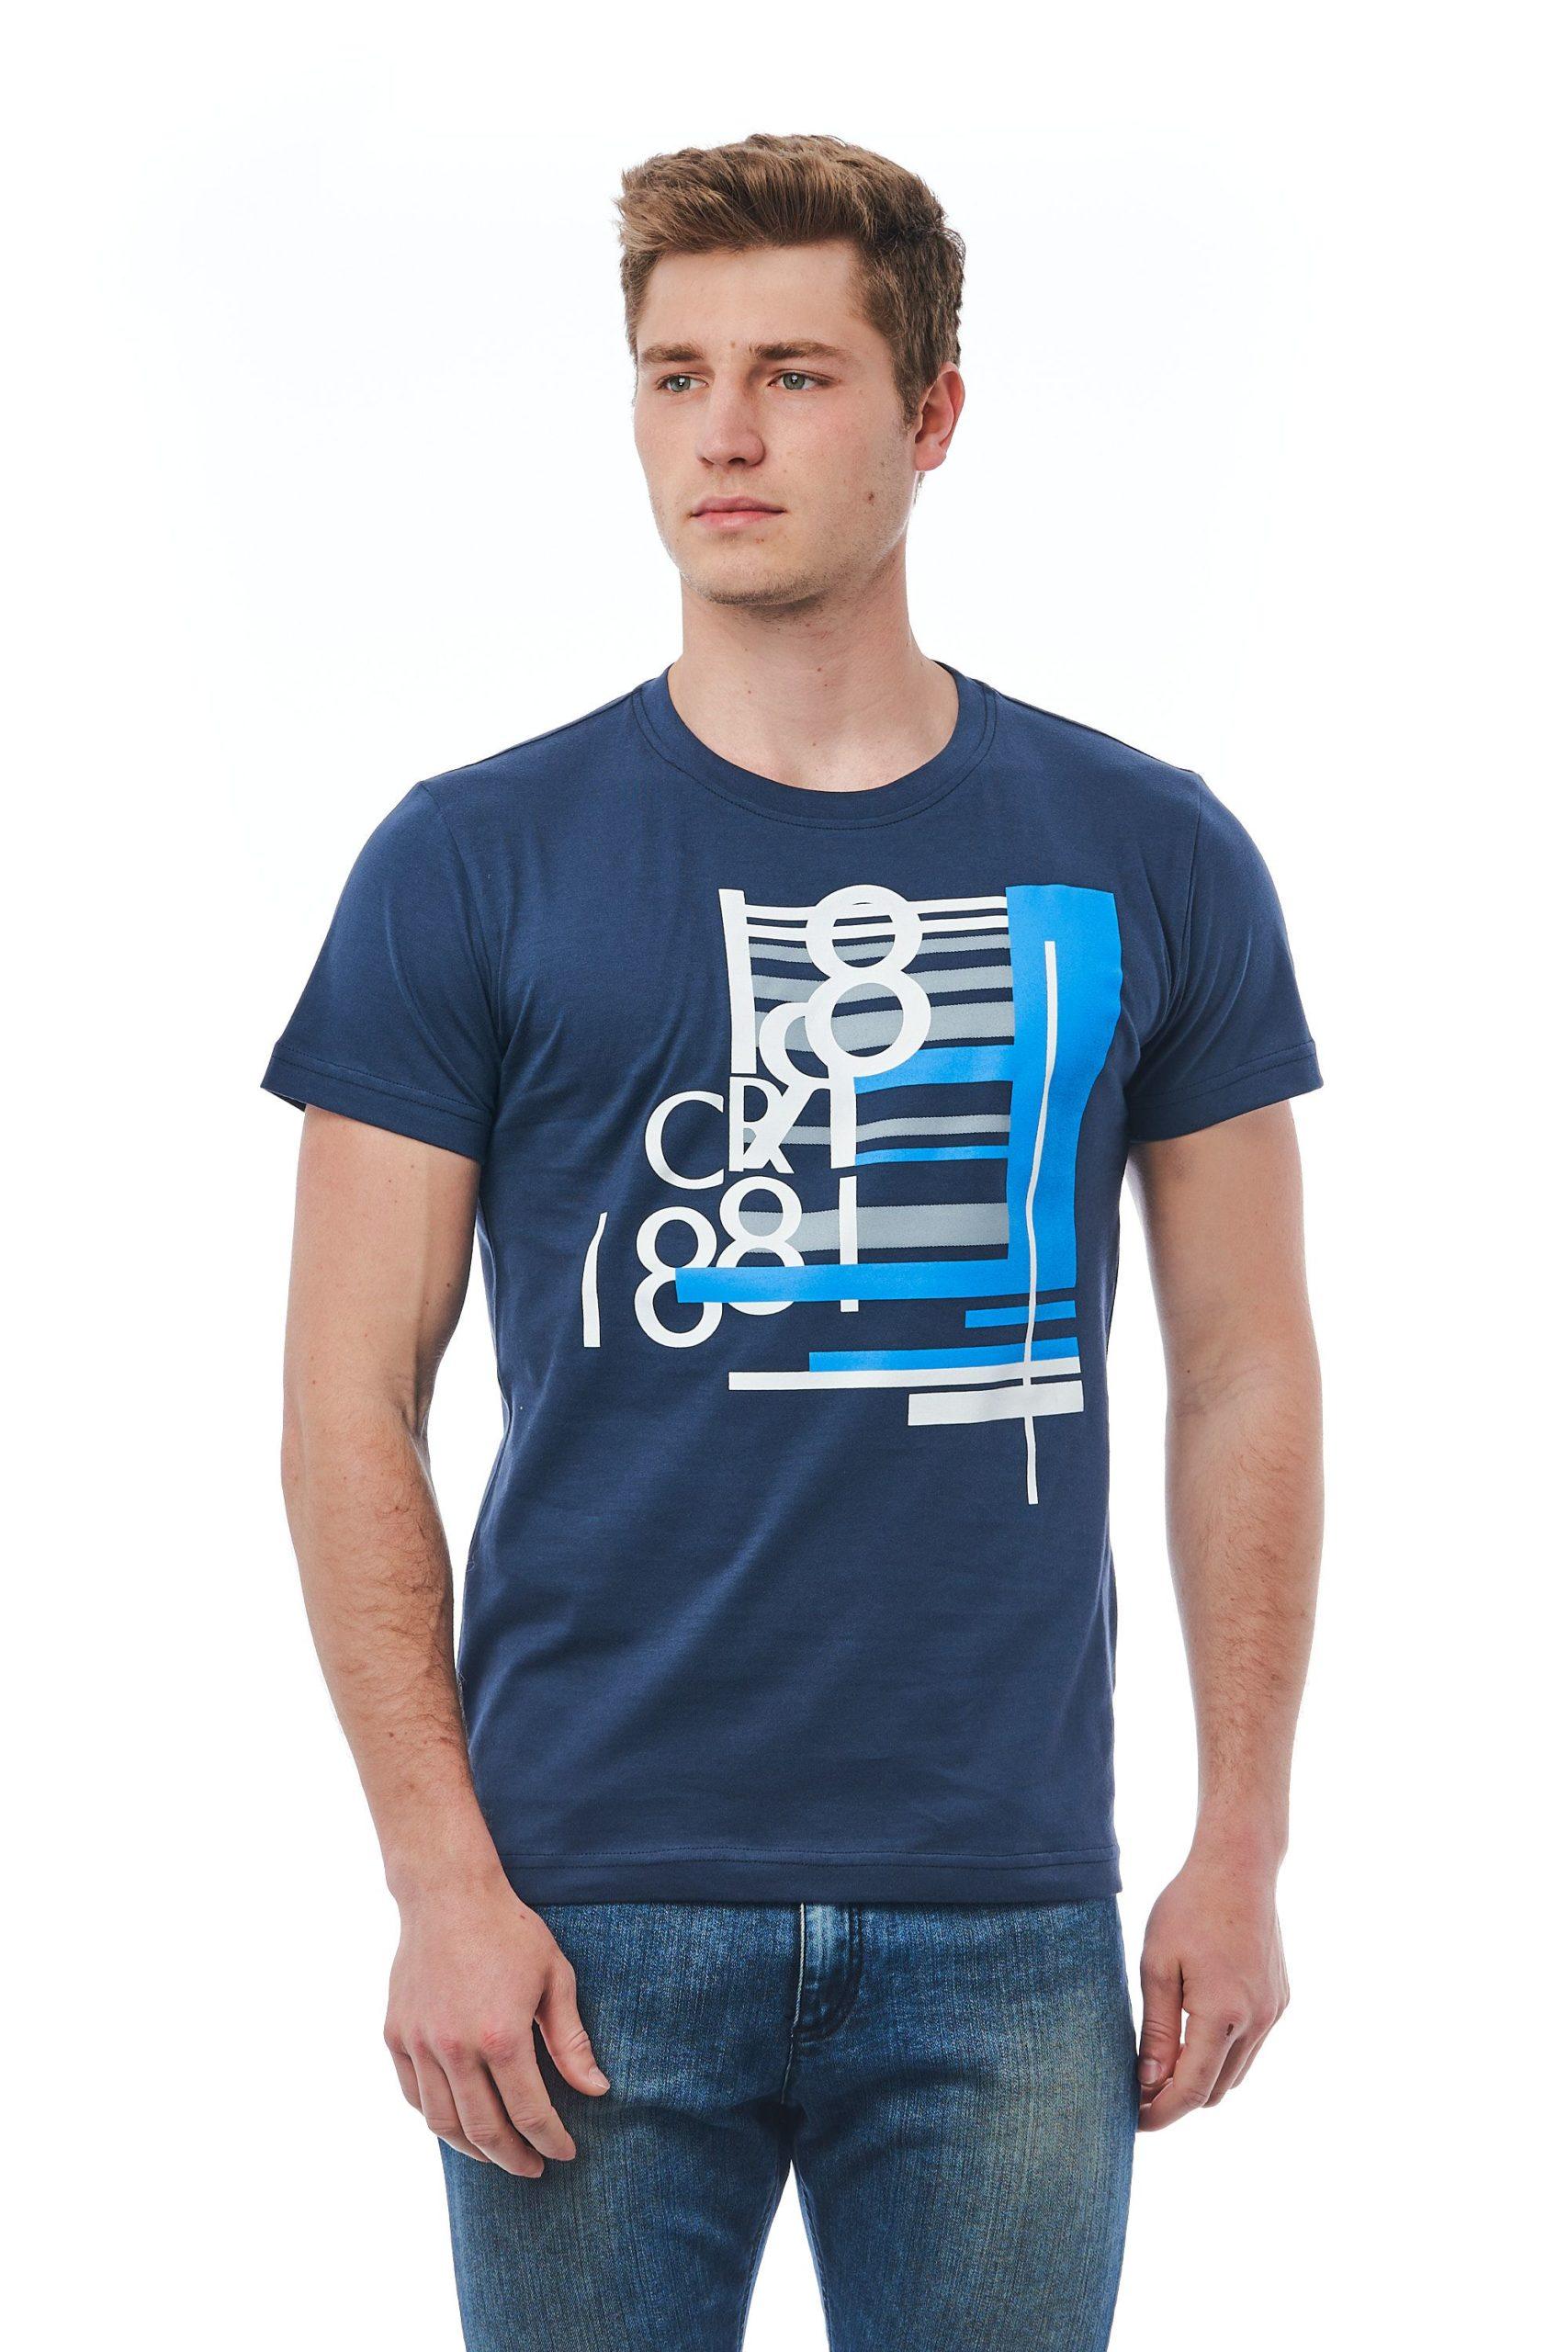 Cerruti 1881 Men's Blu Navy T-Shirt Blue CE1410094 - M